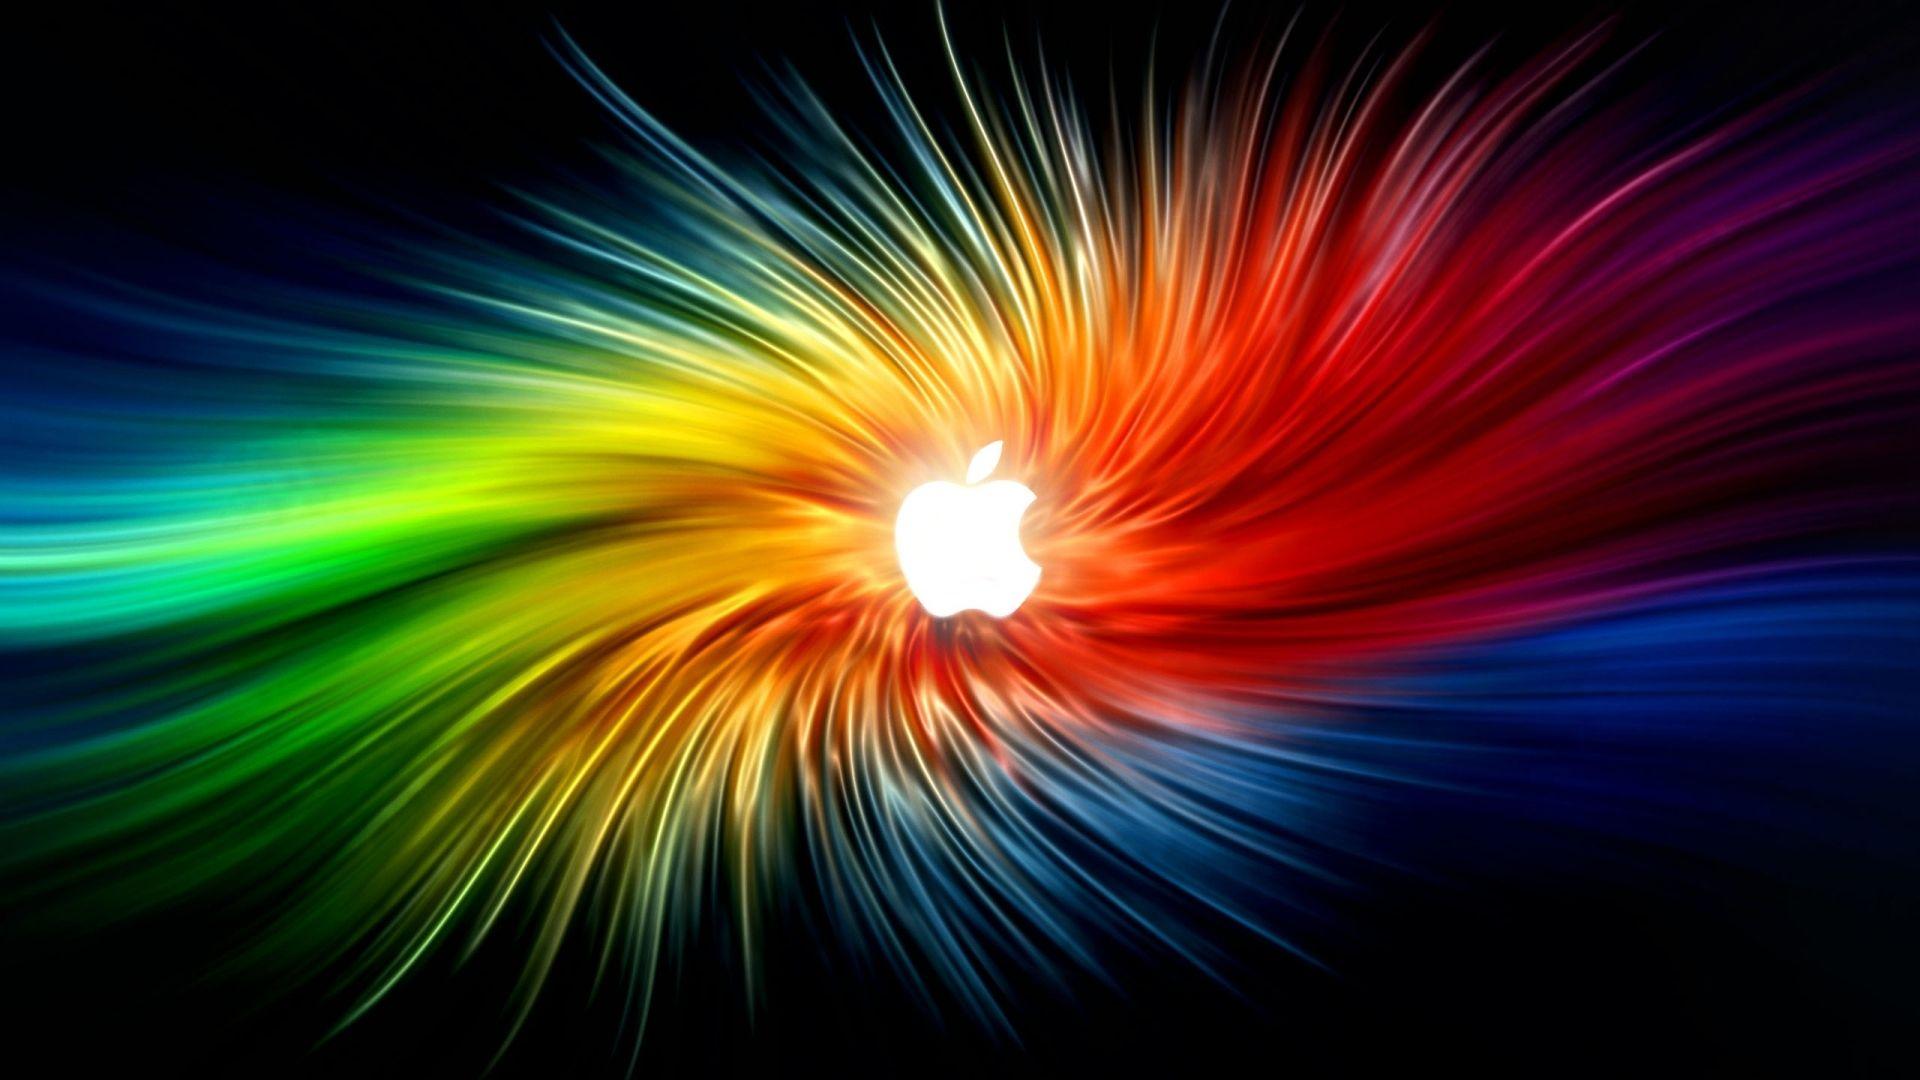 Apple Sirl 1080p Hd Wallpaper Fondos De Pantalla Gratis Fondos Molones Fondos De Colores